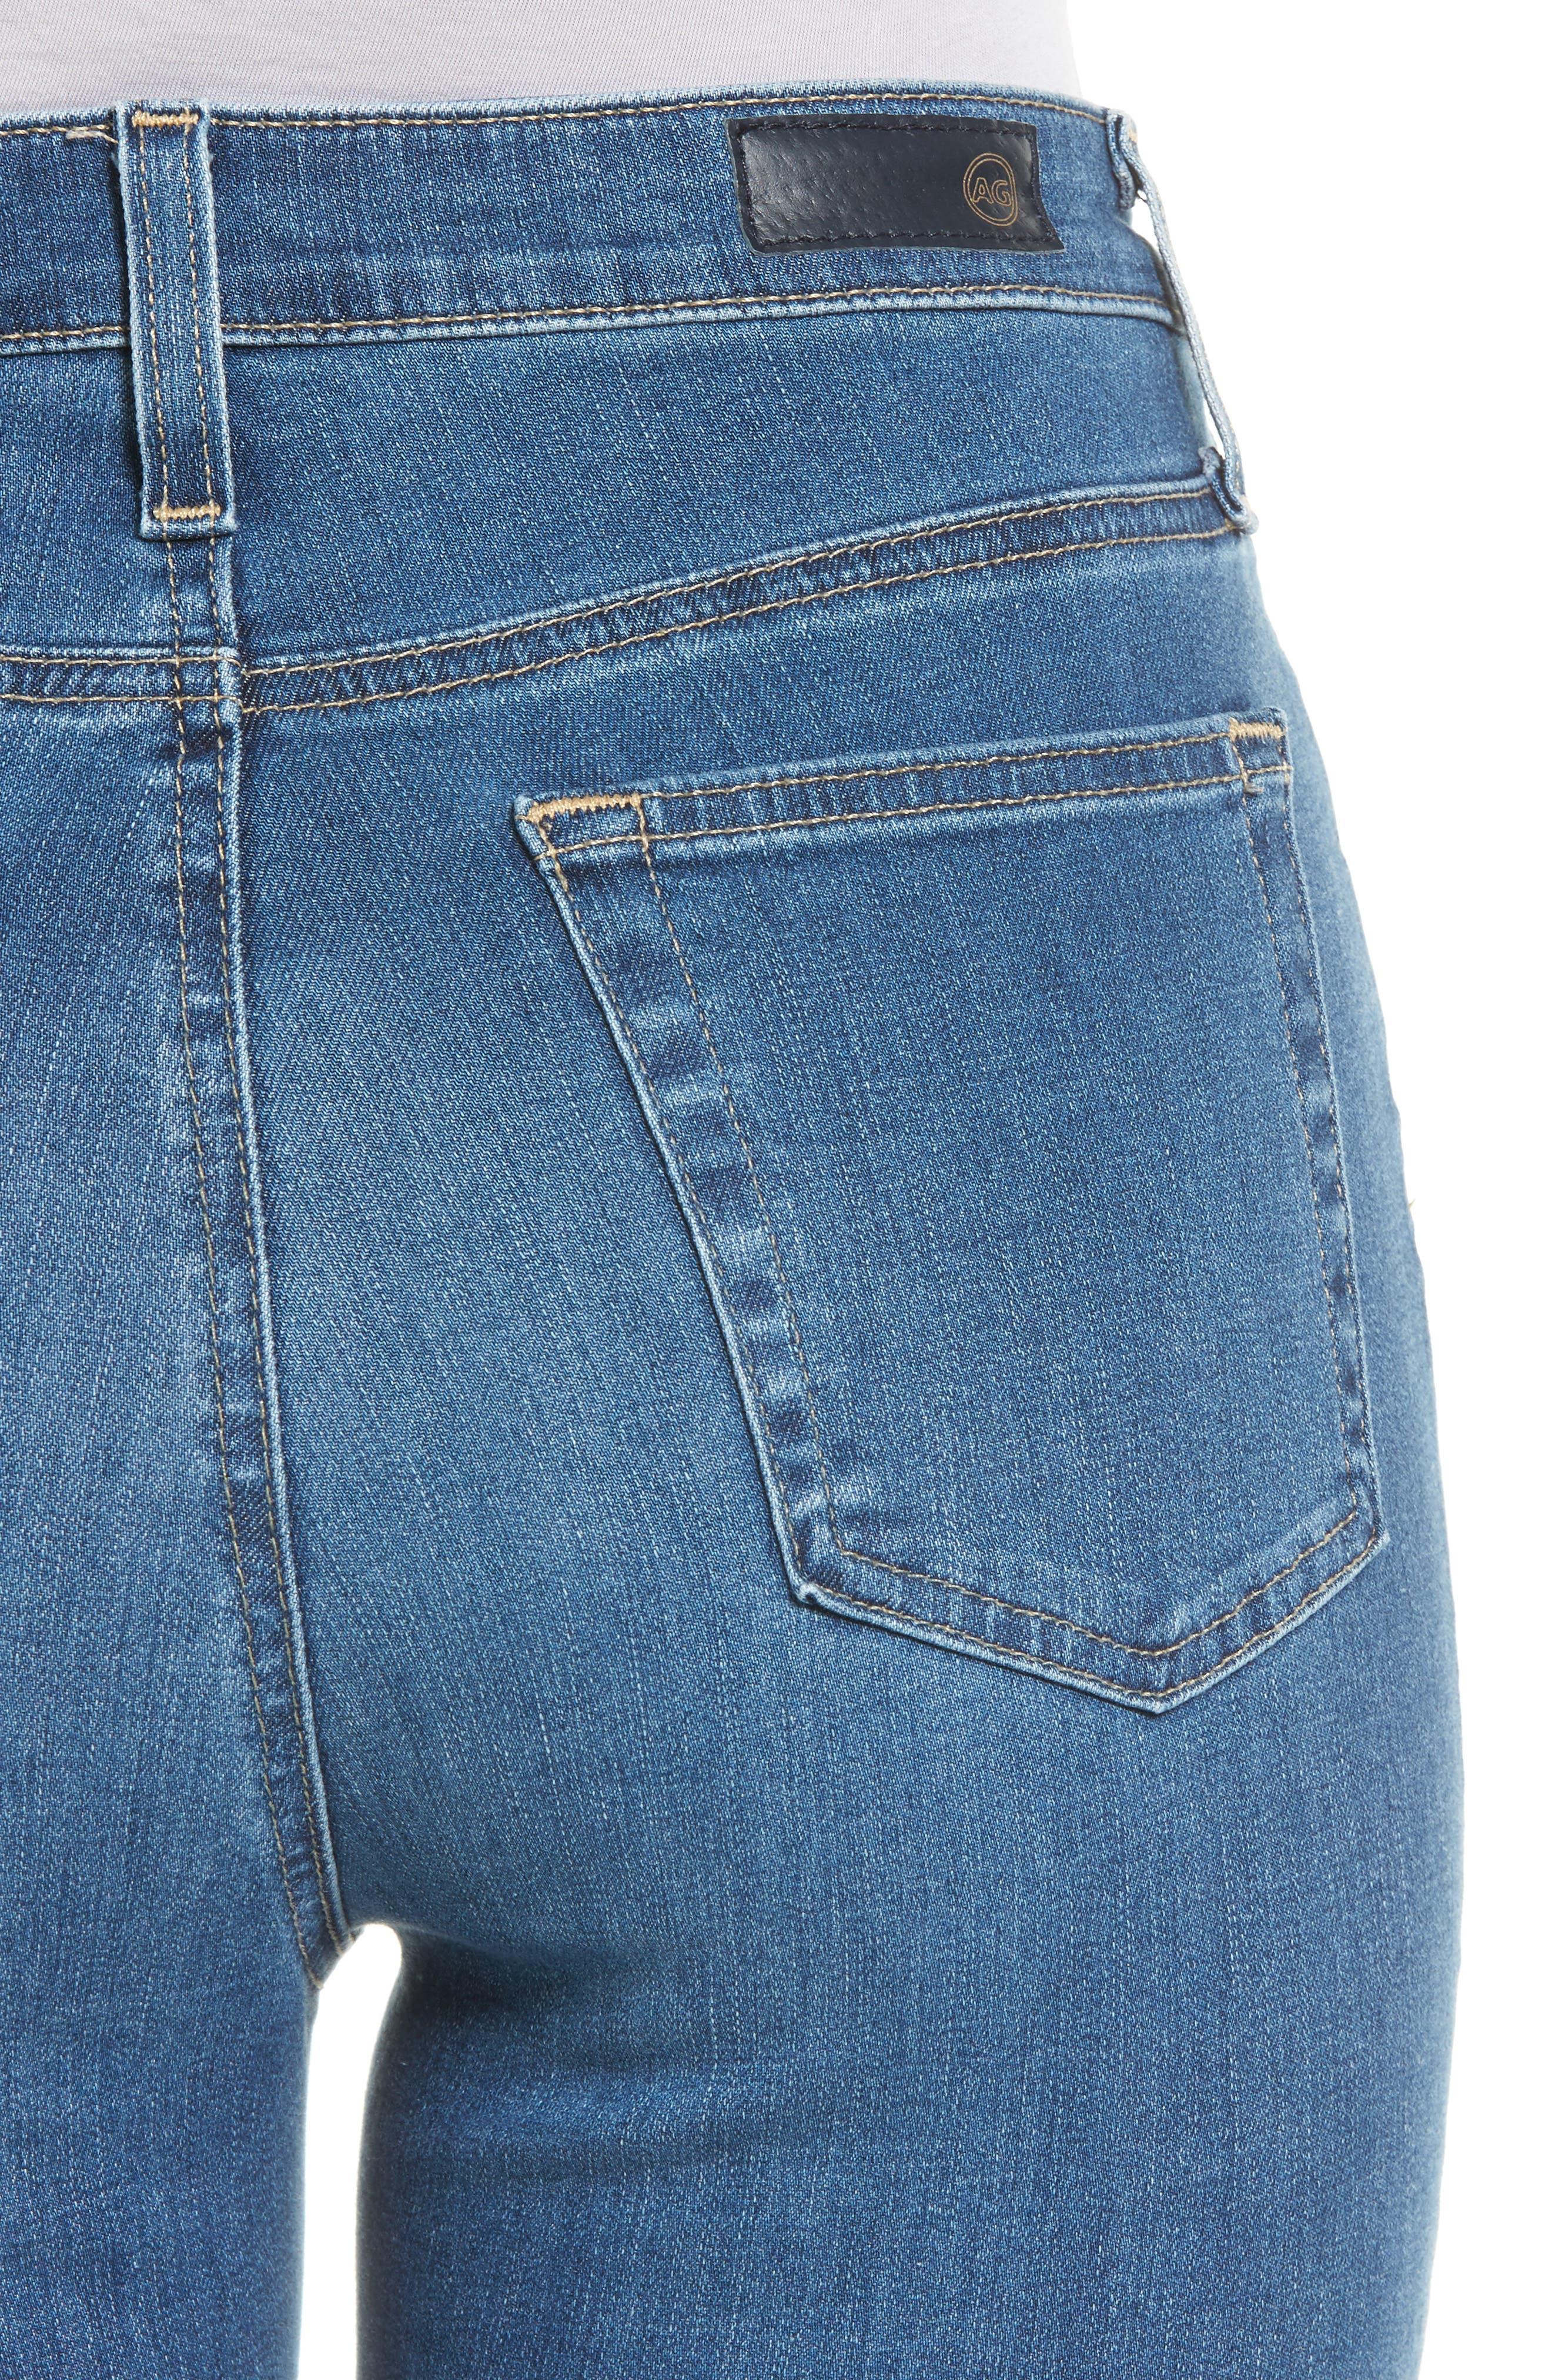 Mila High Waist Ankle Skinny Jeans,                             Alternate thumbnail 4, color,                             Indigo Viking